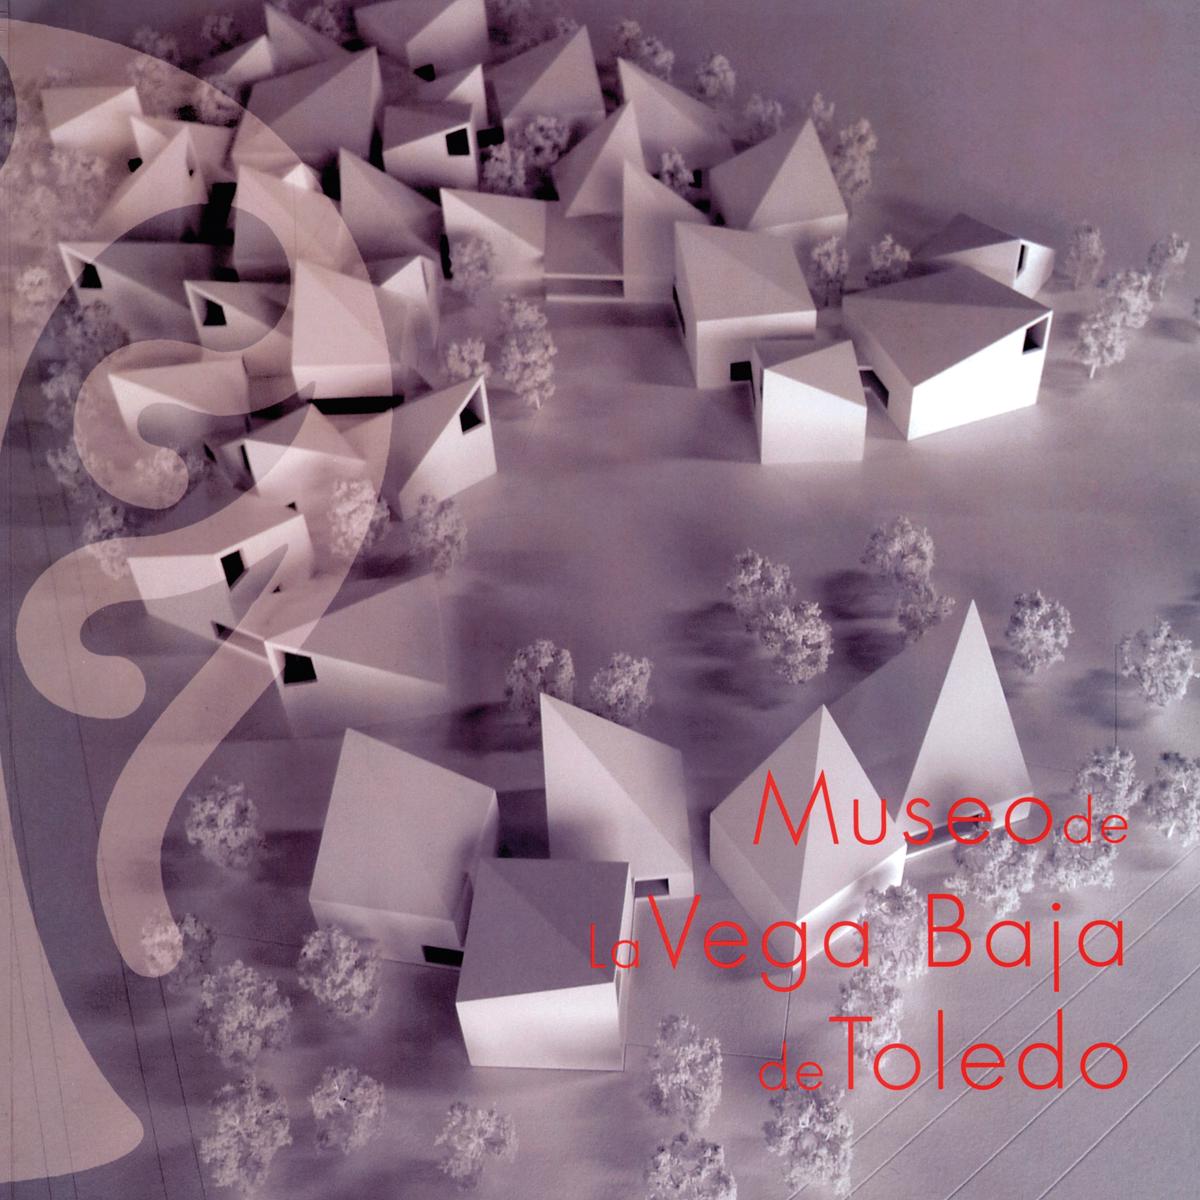 Museo de la Vega Baja de Toledo